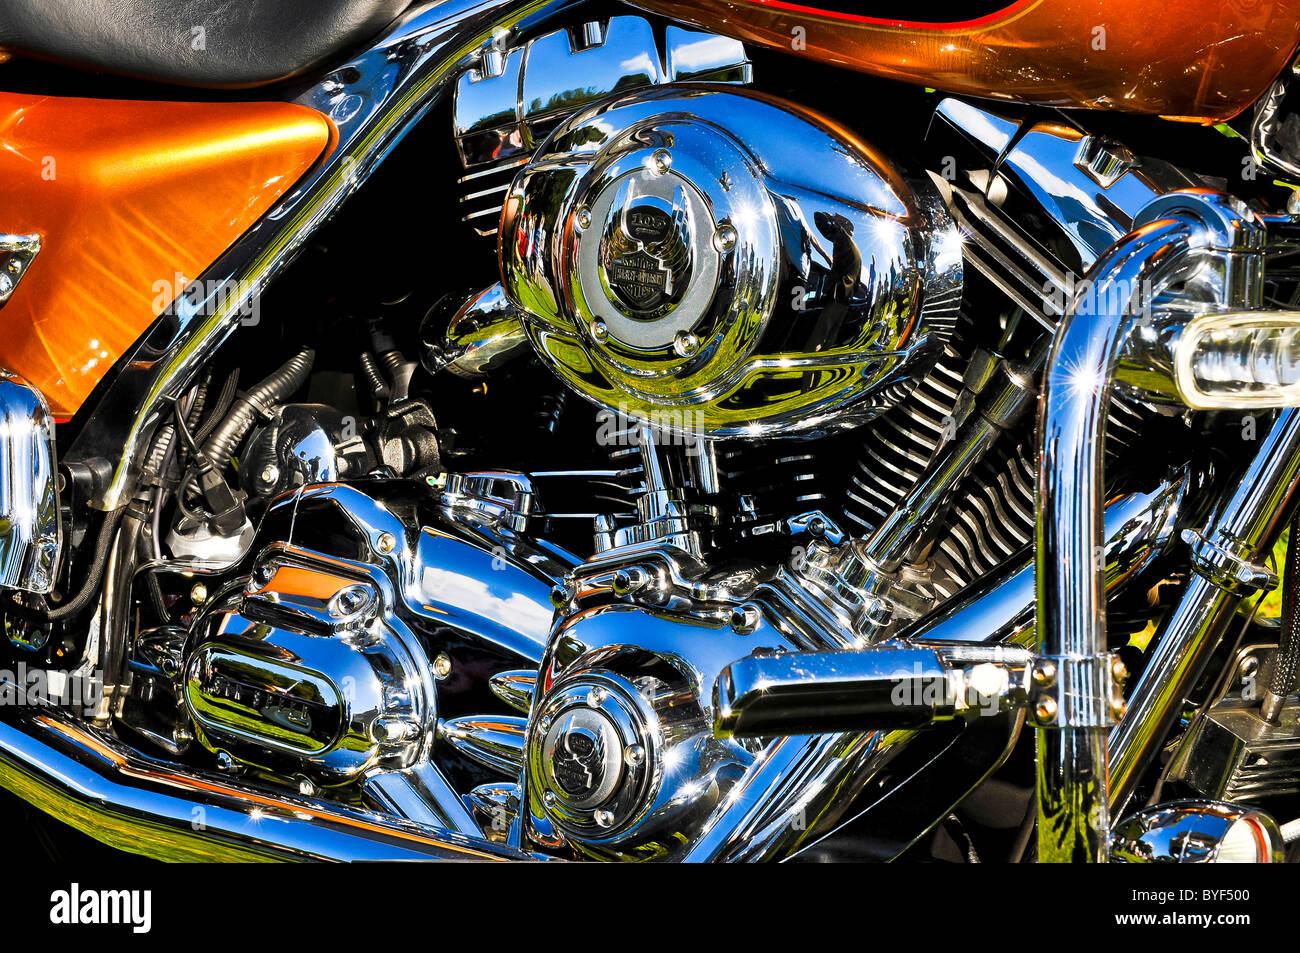 harley davidson,motorbike,detail,shiny,silver,clean,gleaming,new,polish,bike Stock Photo